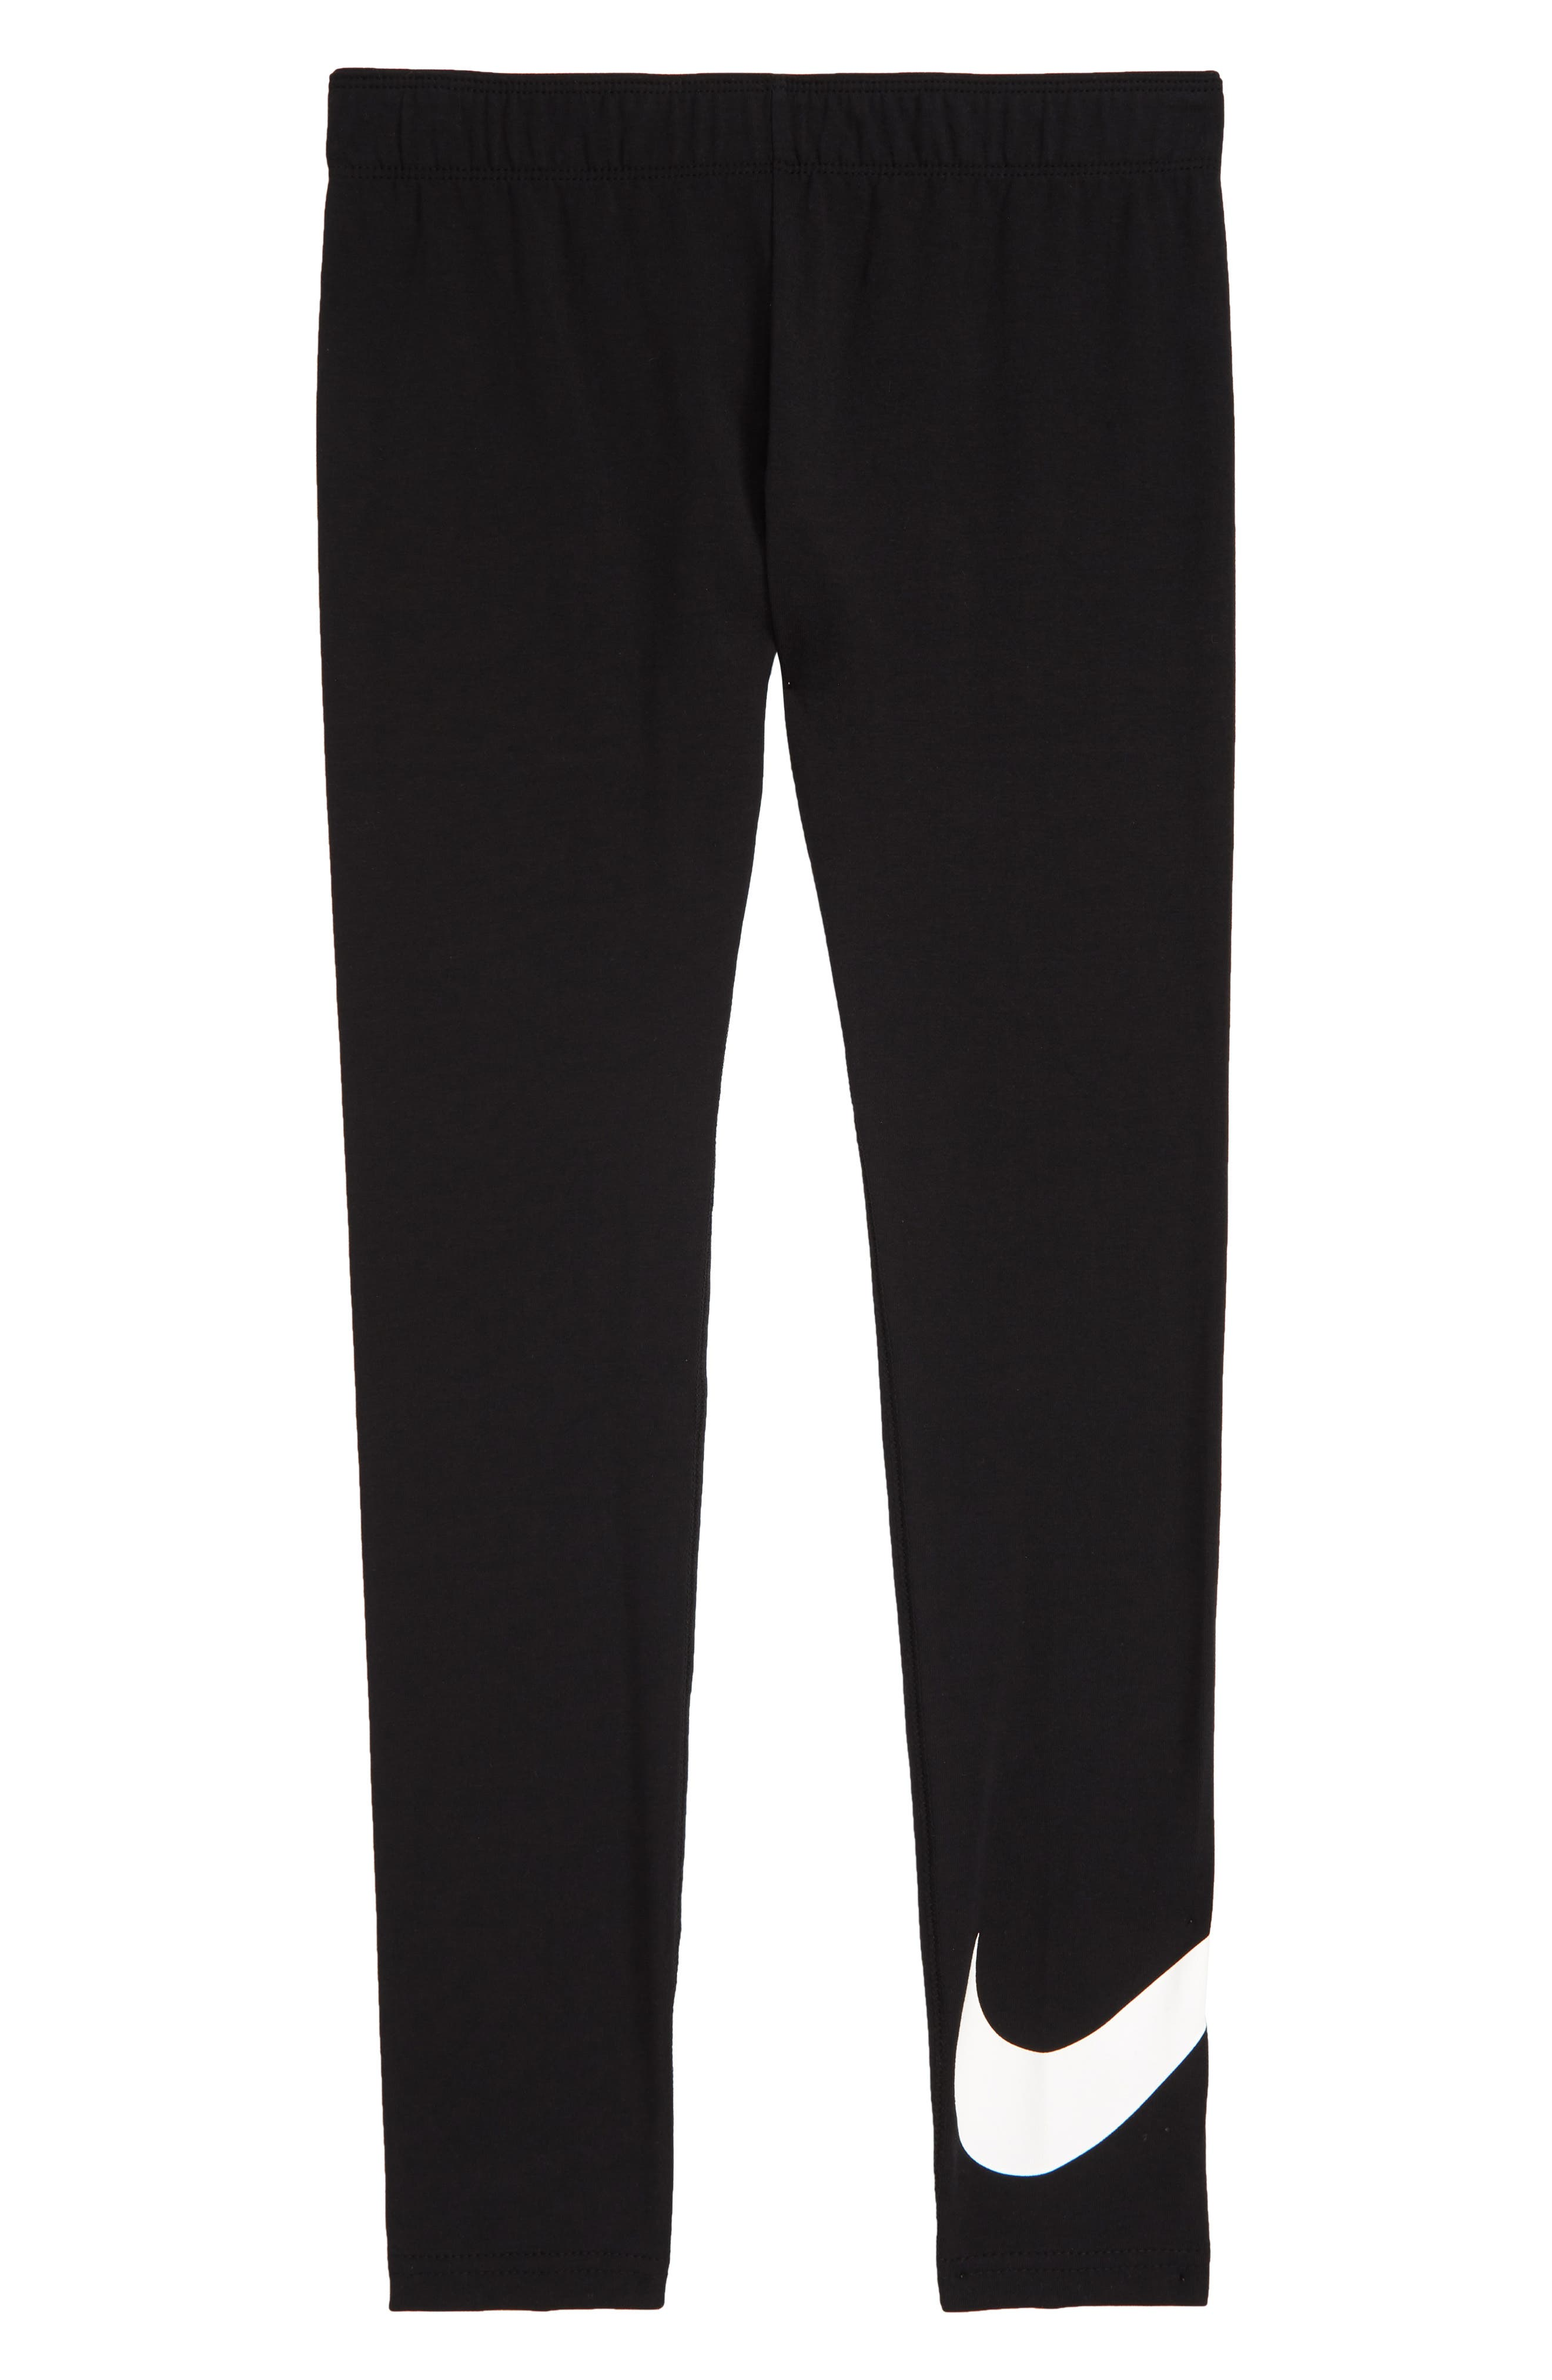 NIKE Sportswear Swoosh Leggings, Main, color, BLACK/ WHITE